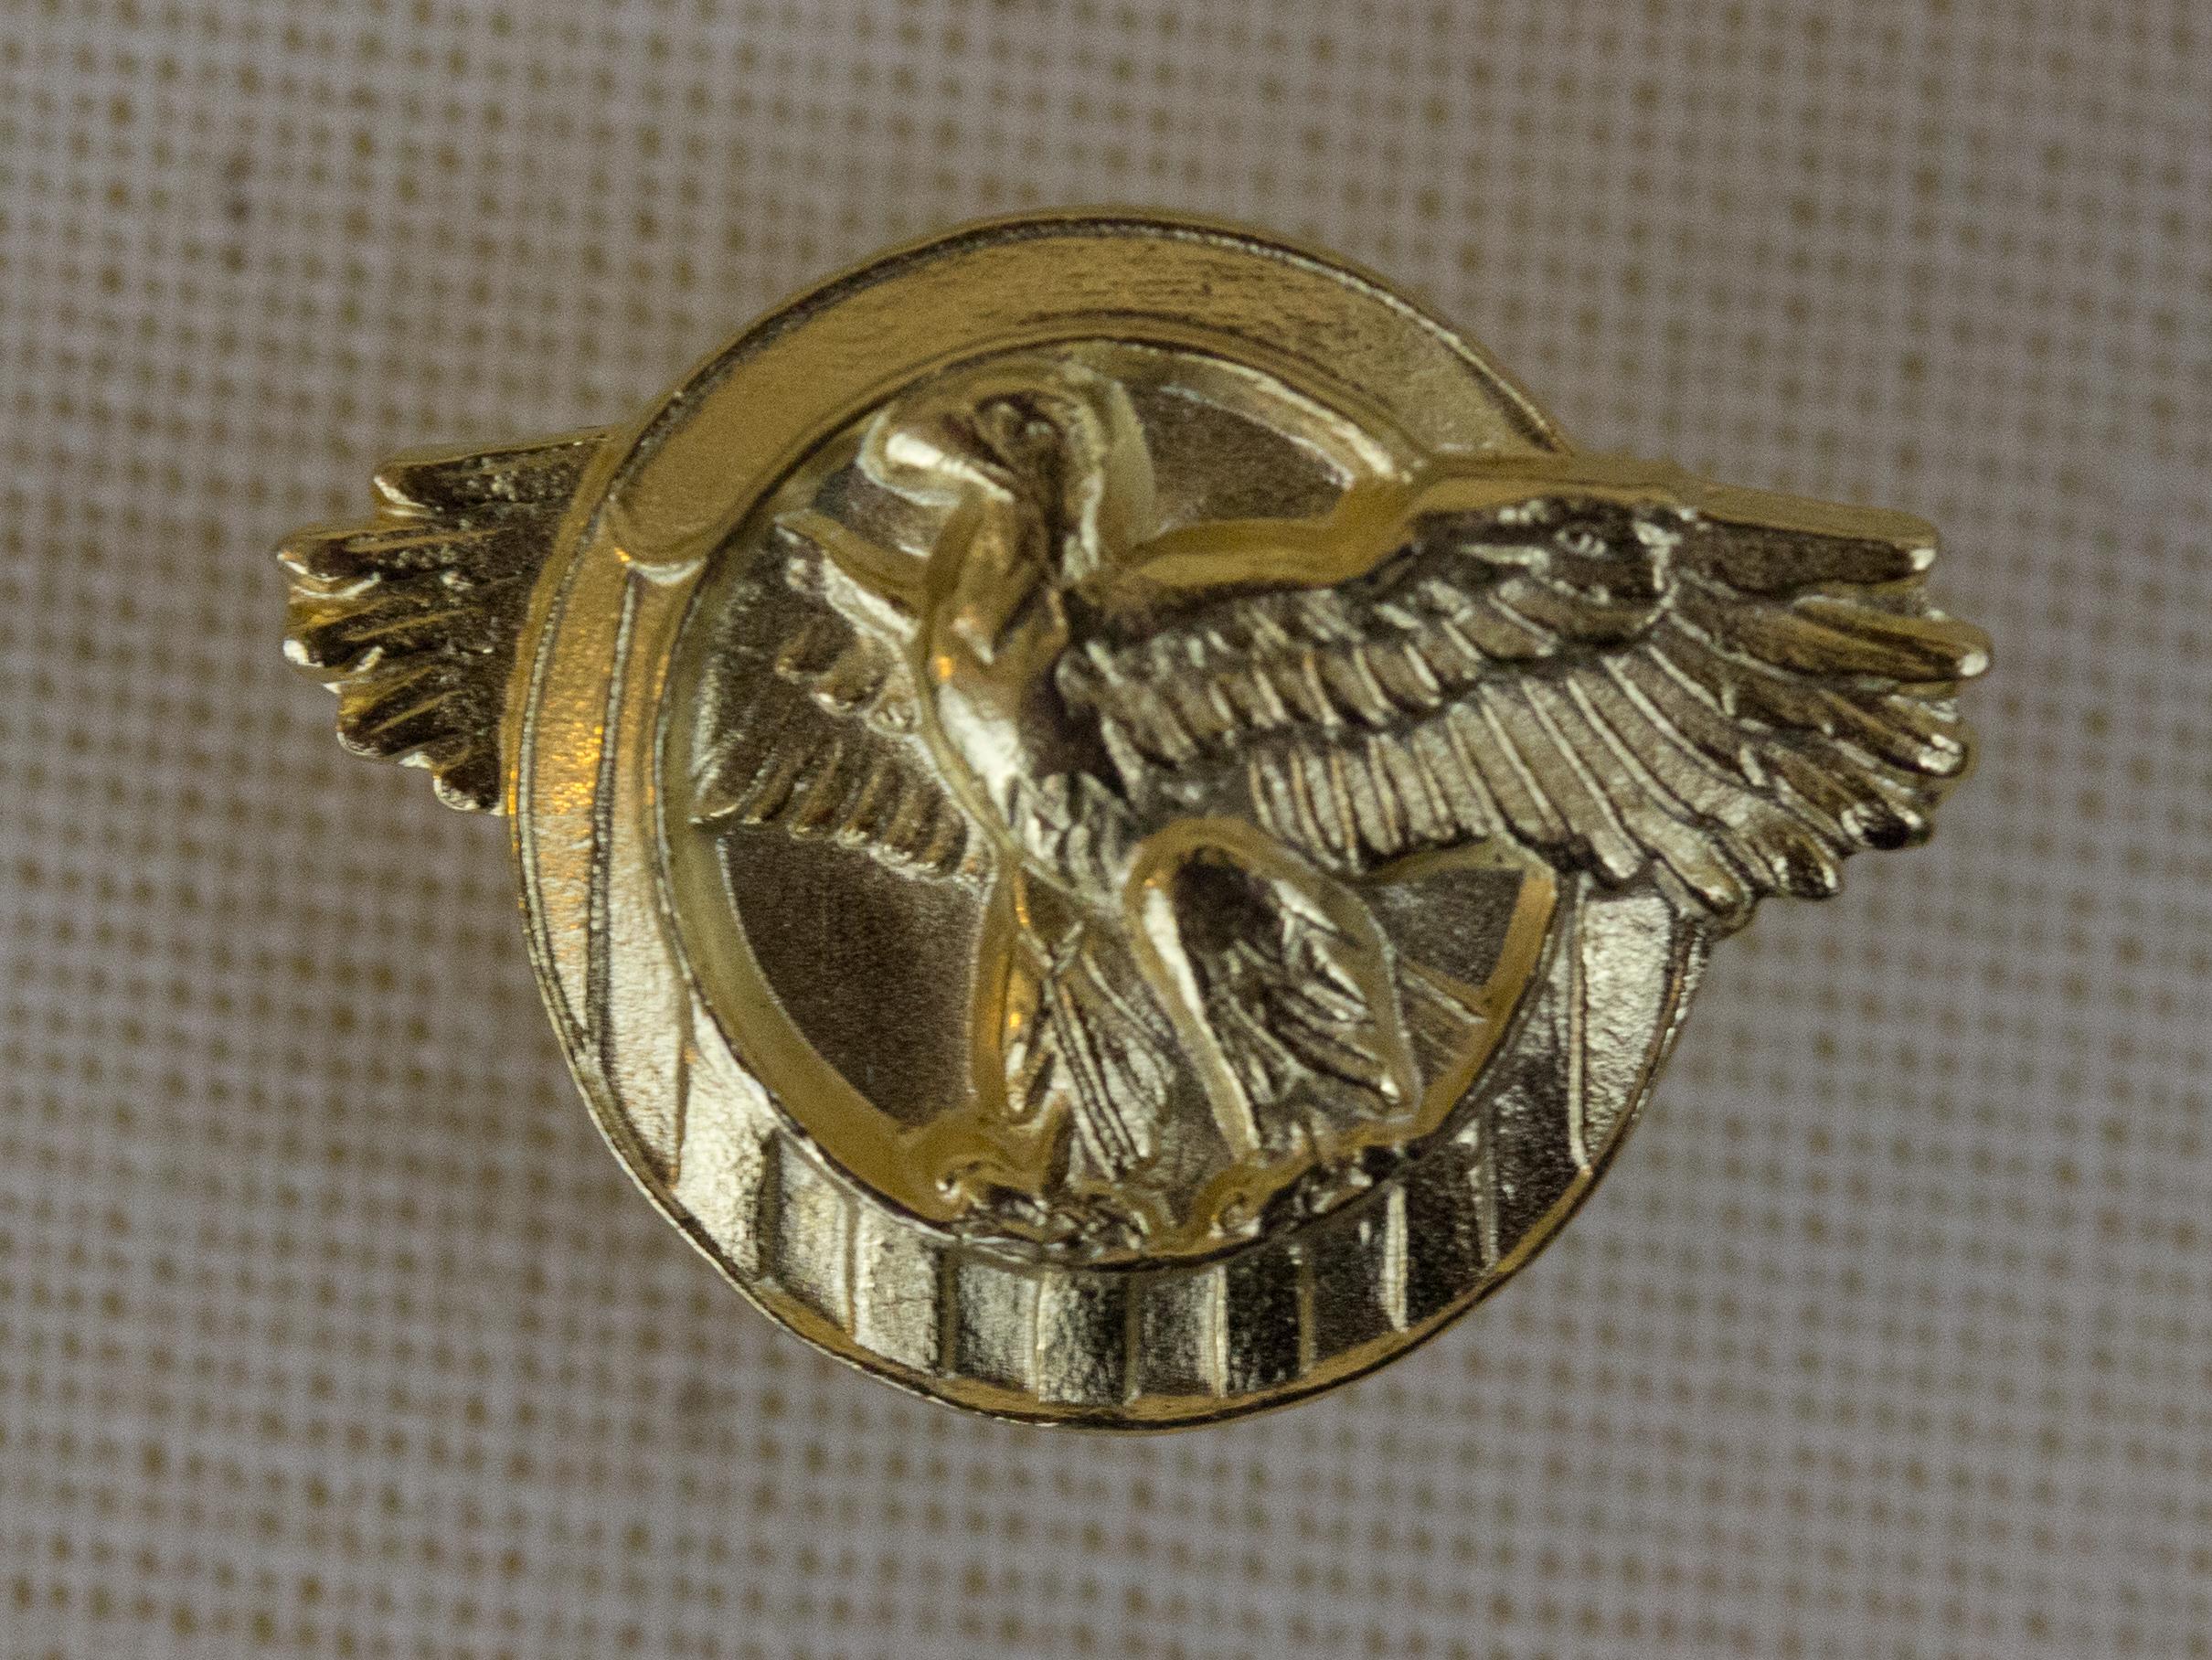 Honorable Service Lapel Button - Wikipedia